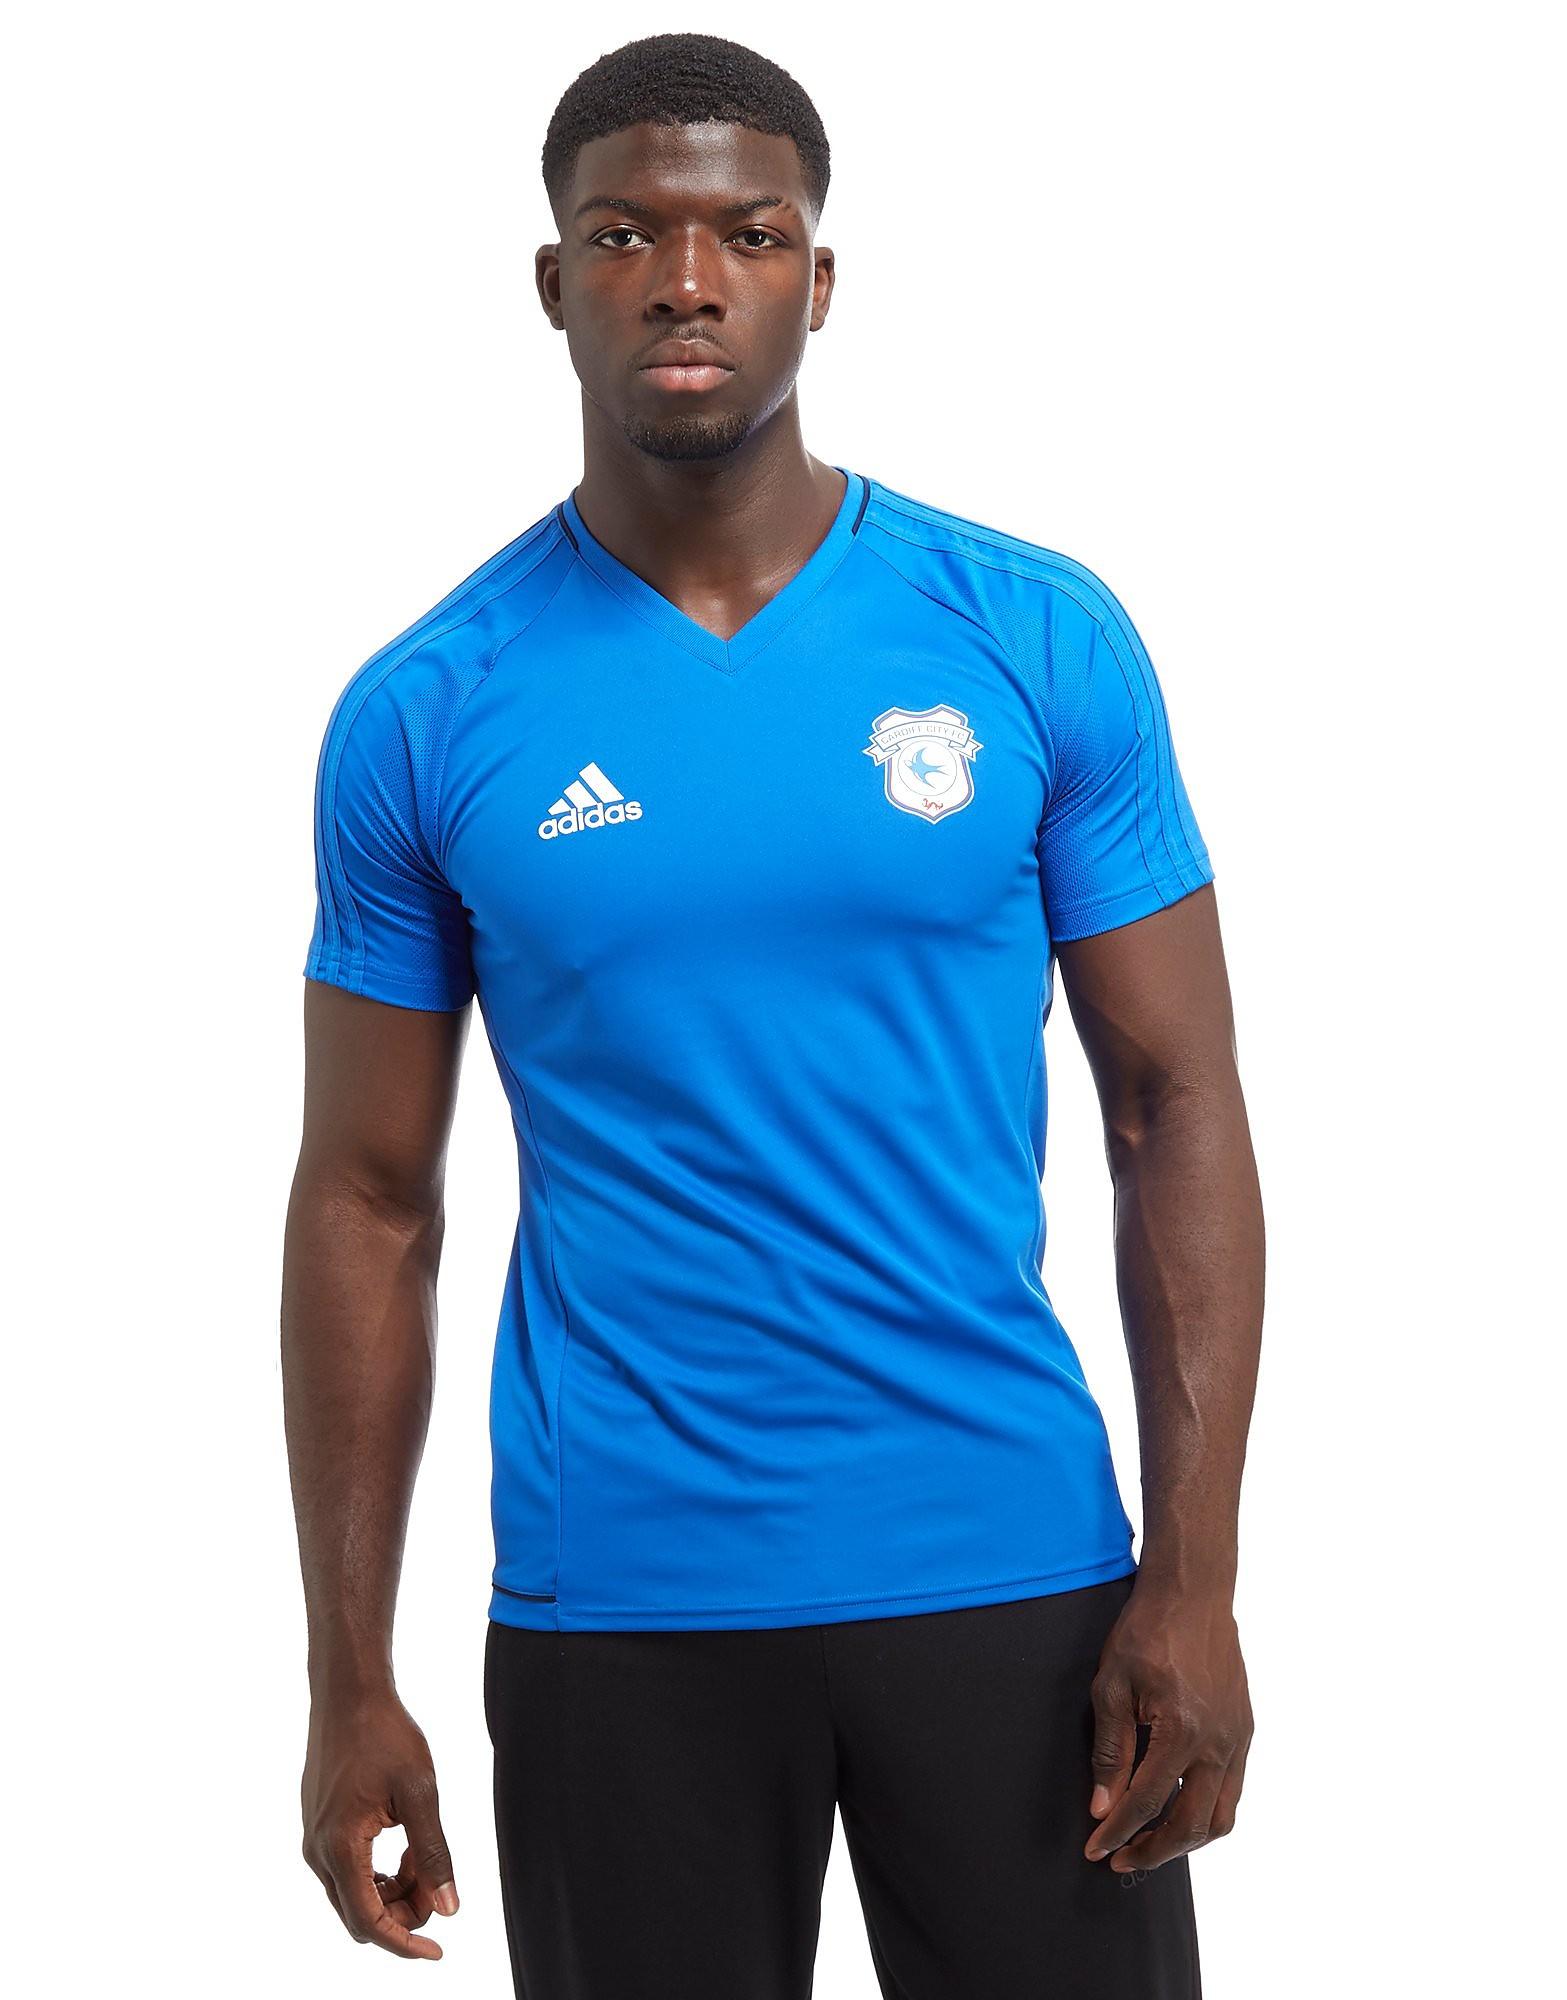 adidas Chemise d'entraînement adidas Cardiff City FC - bleu, bleu